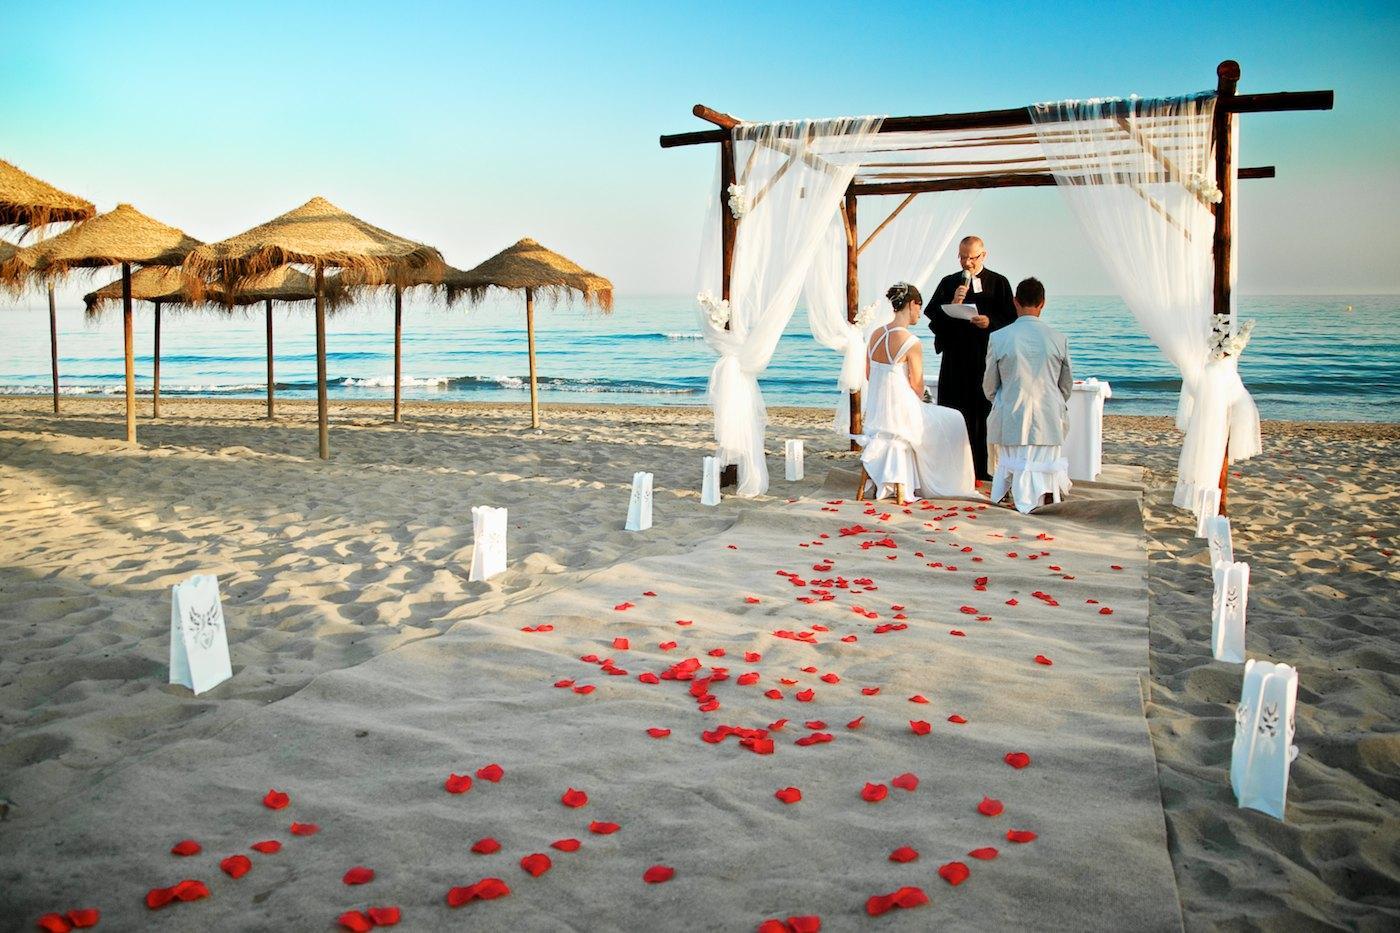 7 Alternative Wedding Venues To Consider - WeddingsAbroad.com